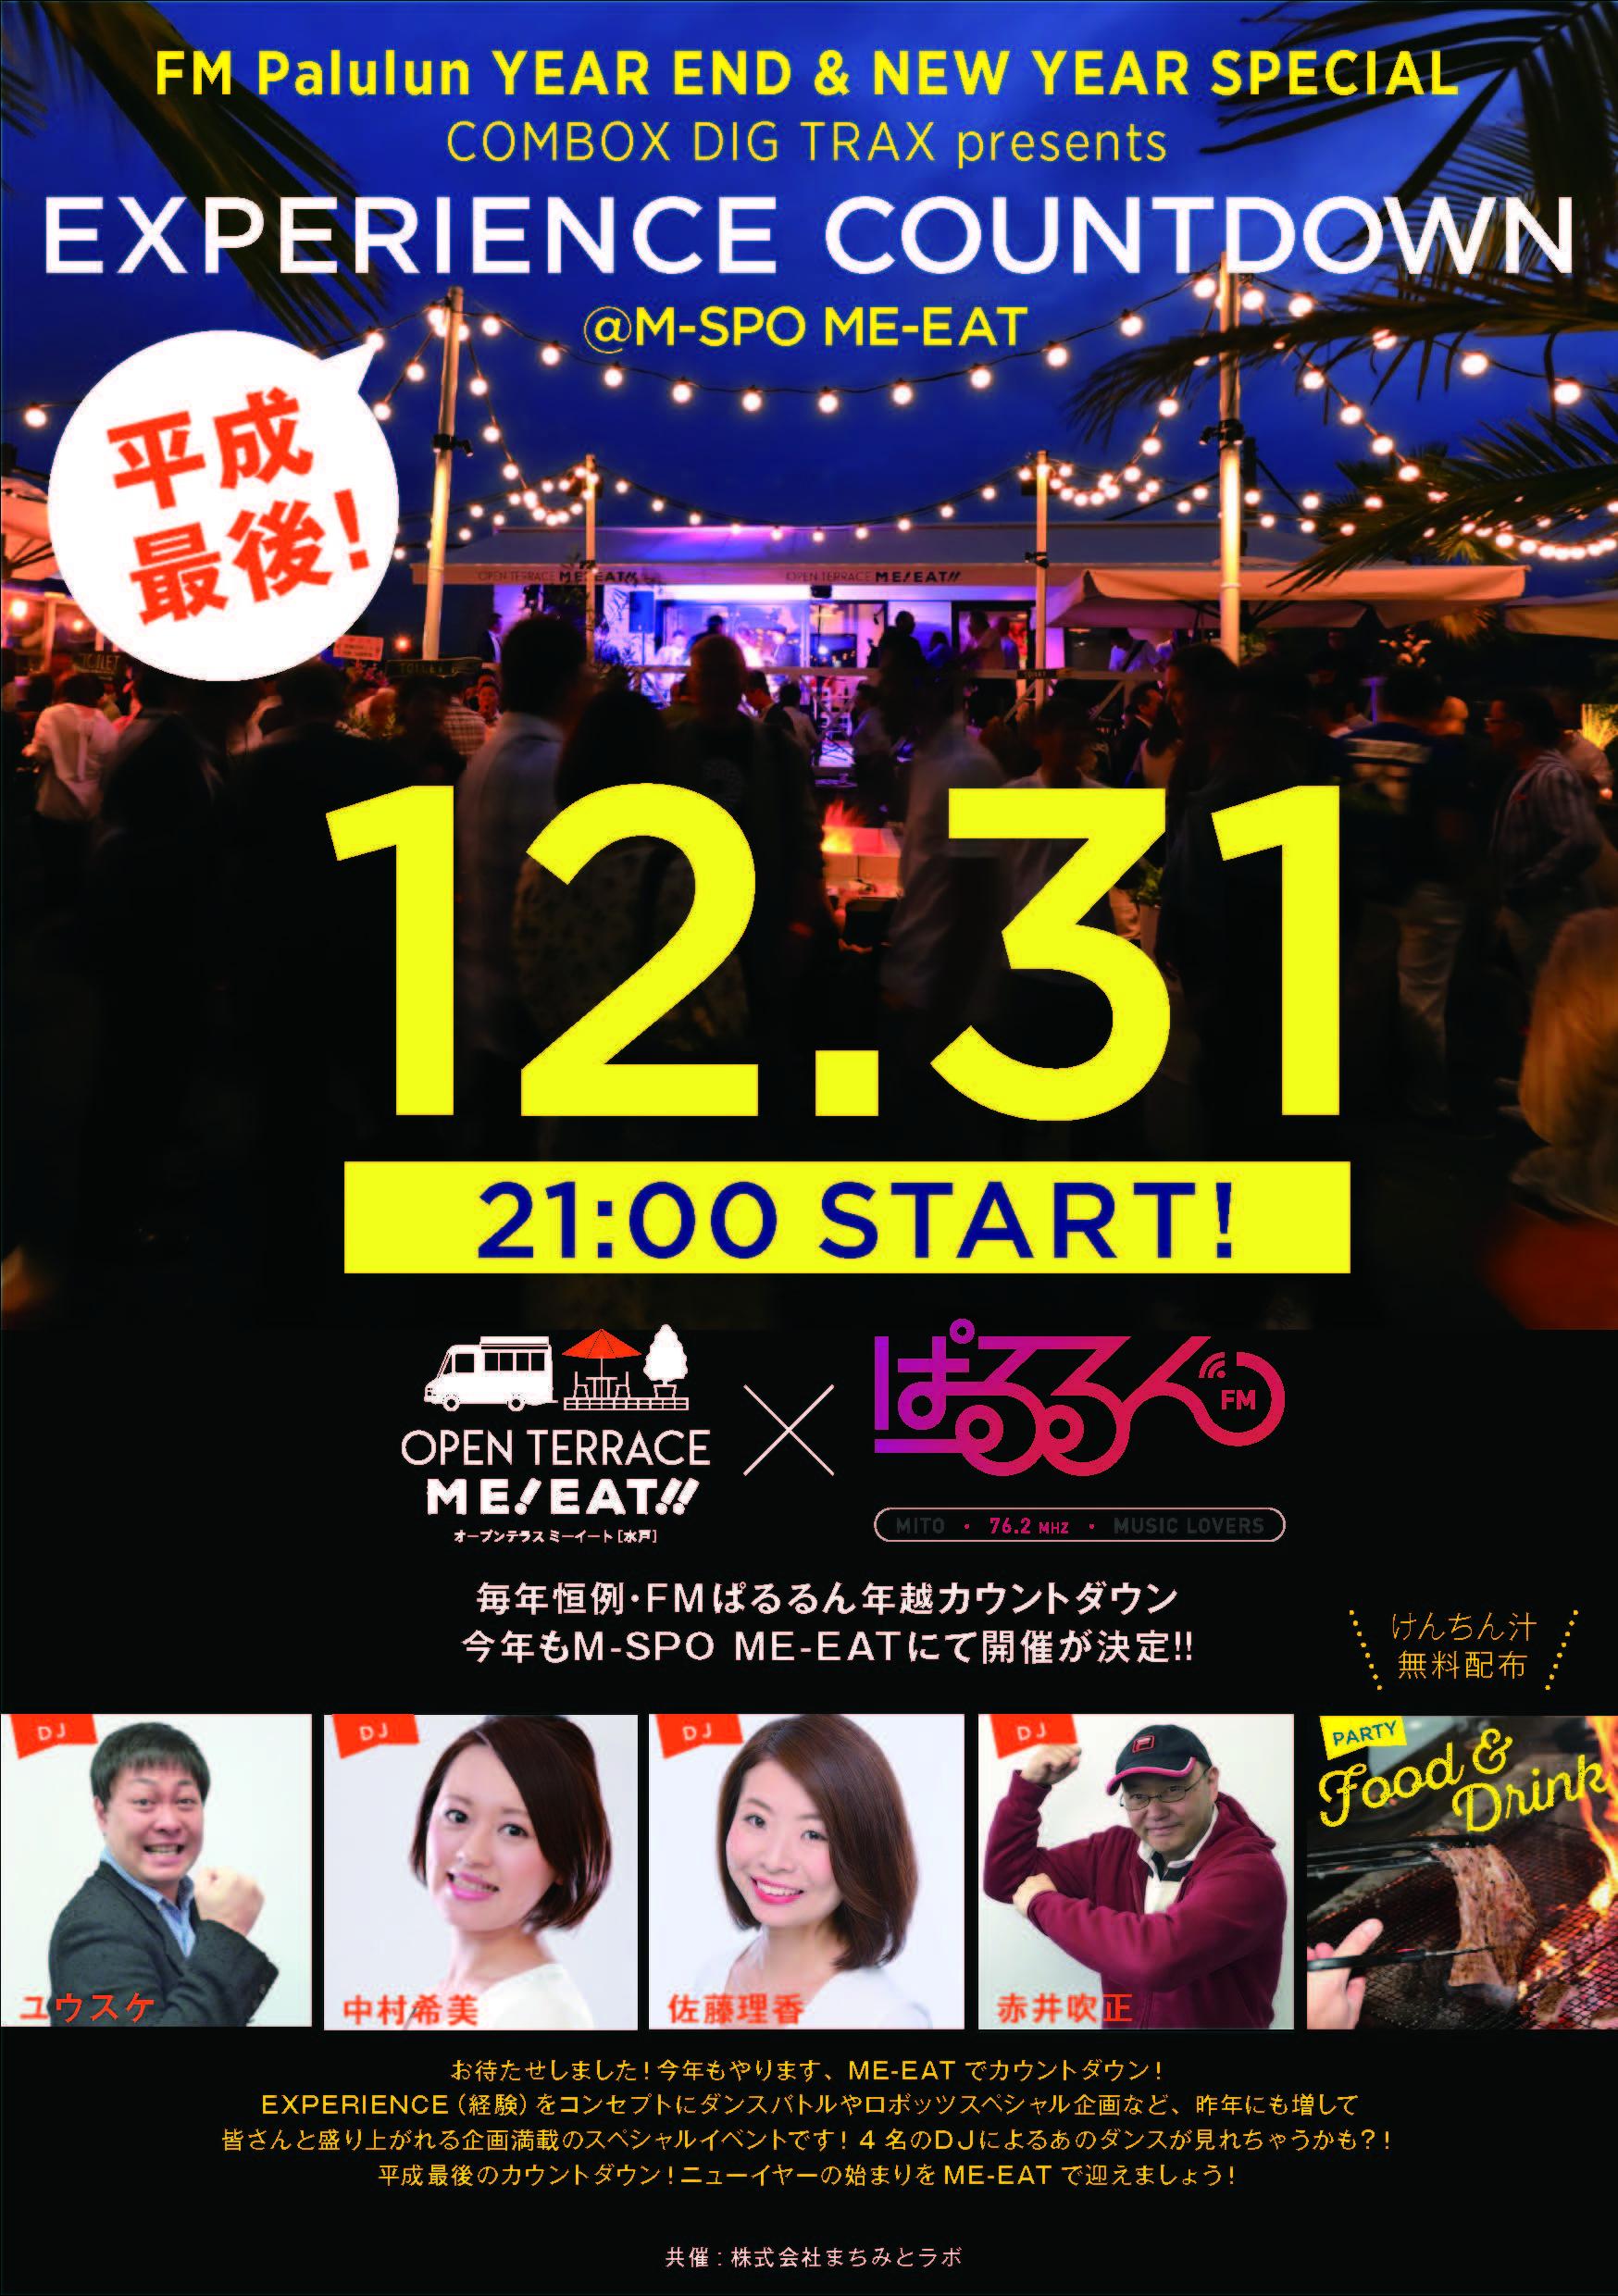 me_countdown_1812_poster_1214.jpg